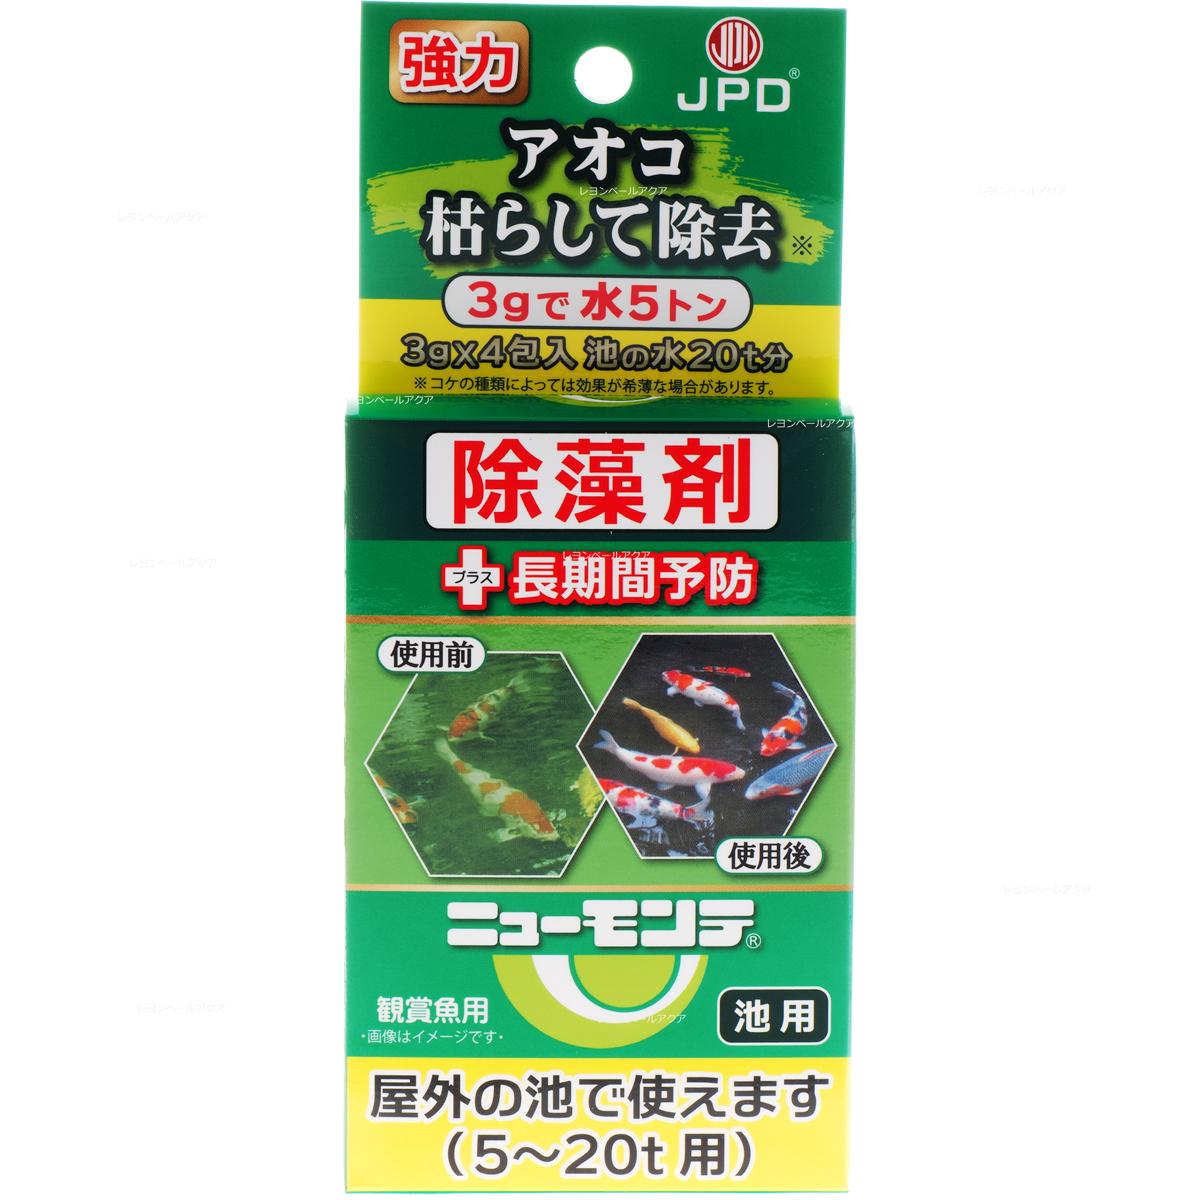 全国送料無料 新商品 在庫有り 即OK 日本動物薬品 池用除藻剤 緑大 ☆送料無料☆ 当日発送可能 ニューモンテ 5g×4 20トン用